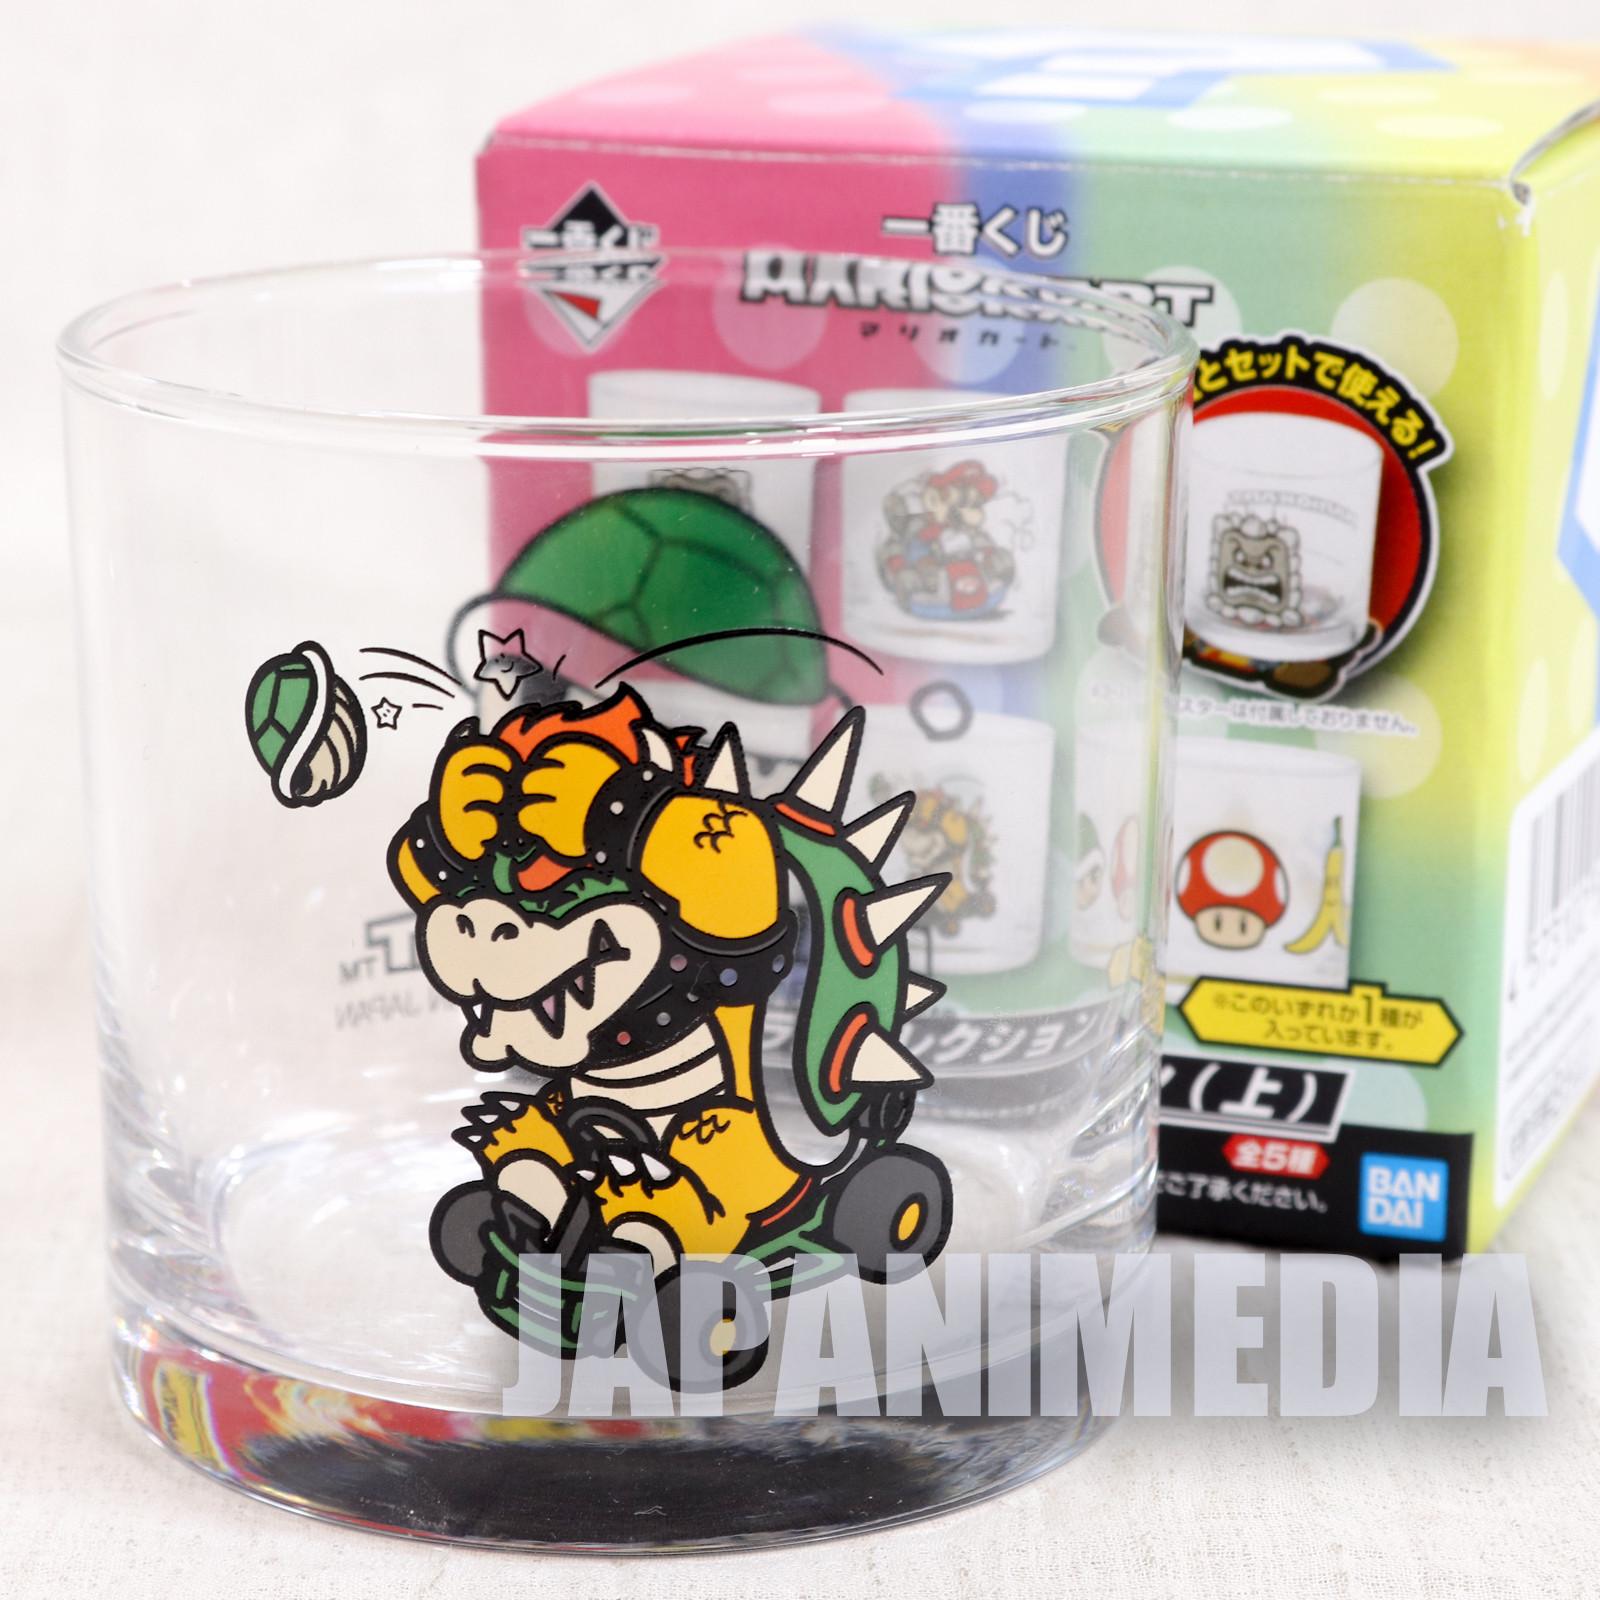 Super Mario Kart Kuppa Bowser Rock Glass Banpresto JAPAN GAME NES